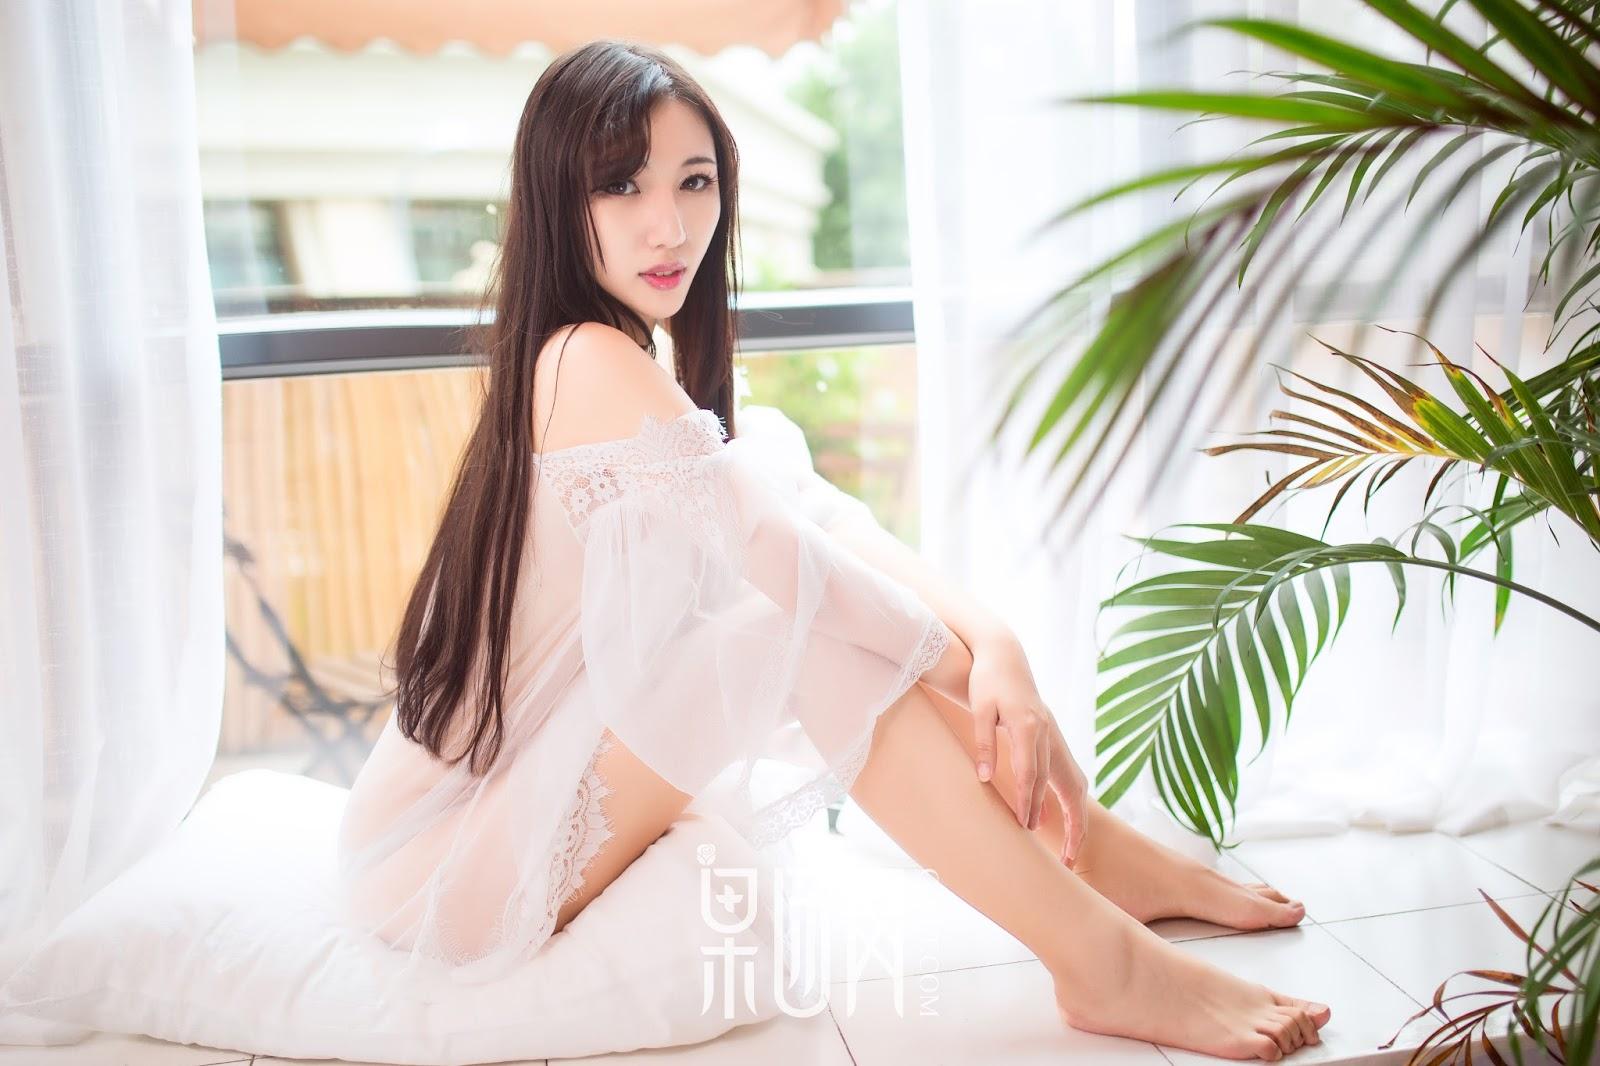 GIRLT - No.078 Mi Tu Tu (63 pics) - Page 3 of 3 - Asian